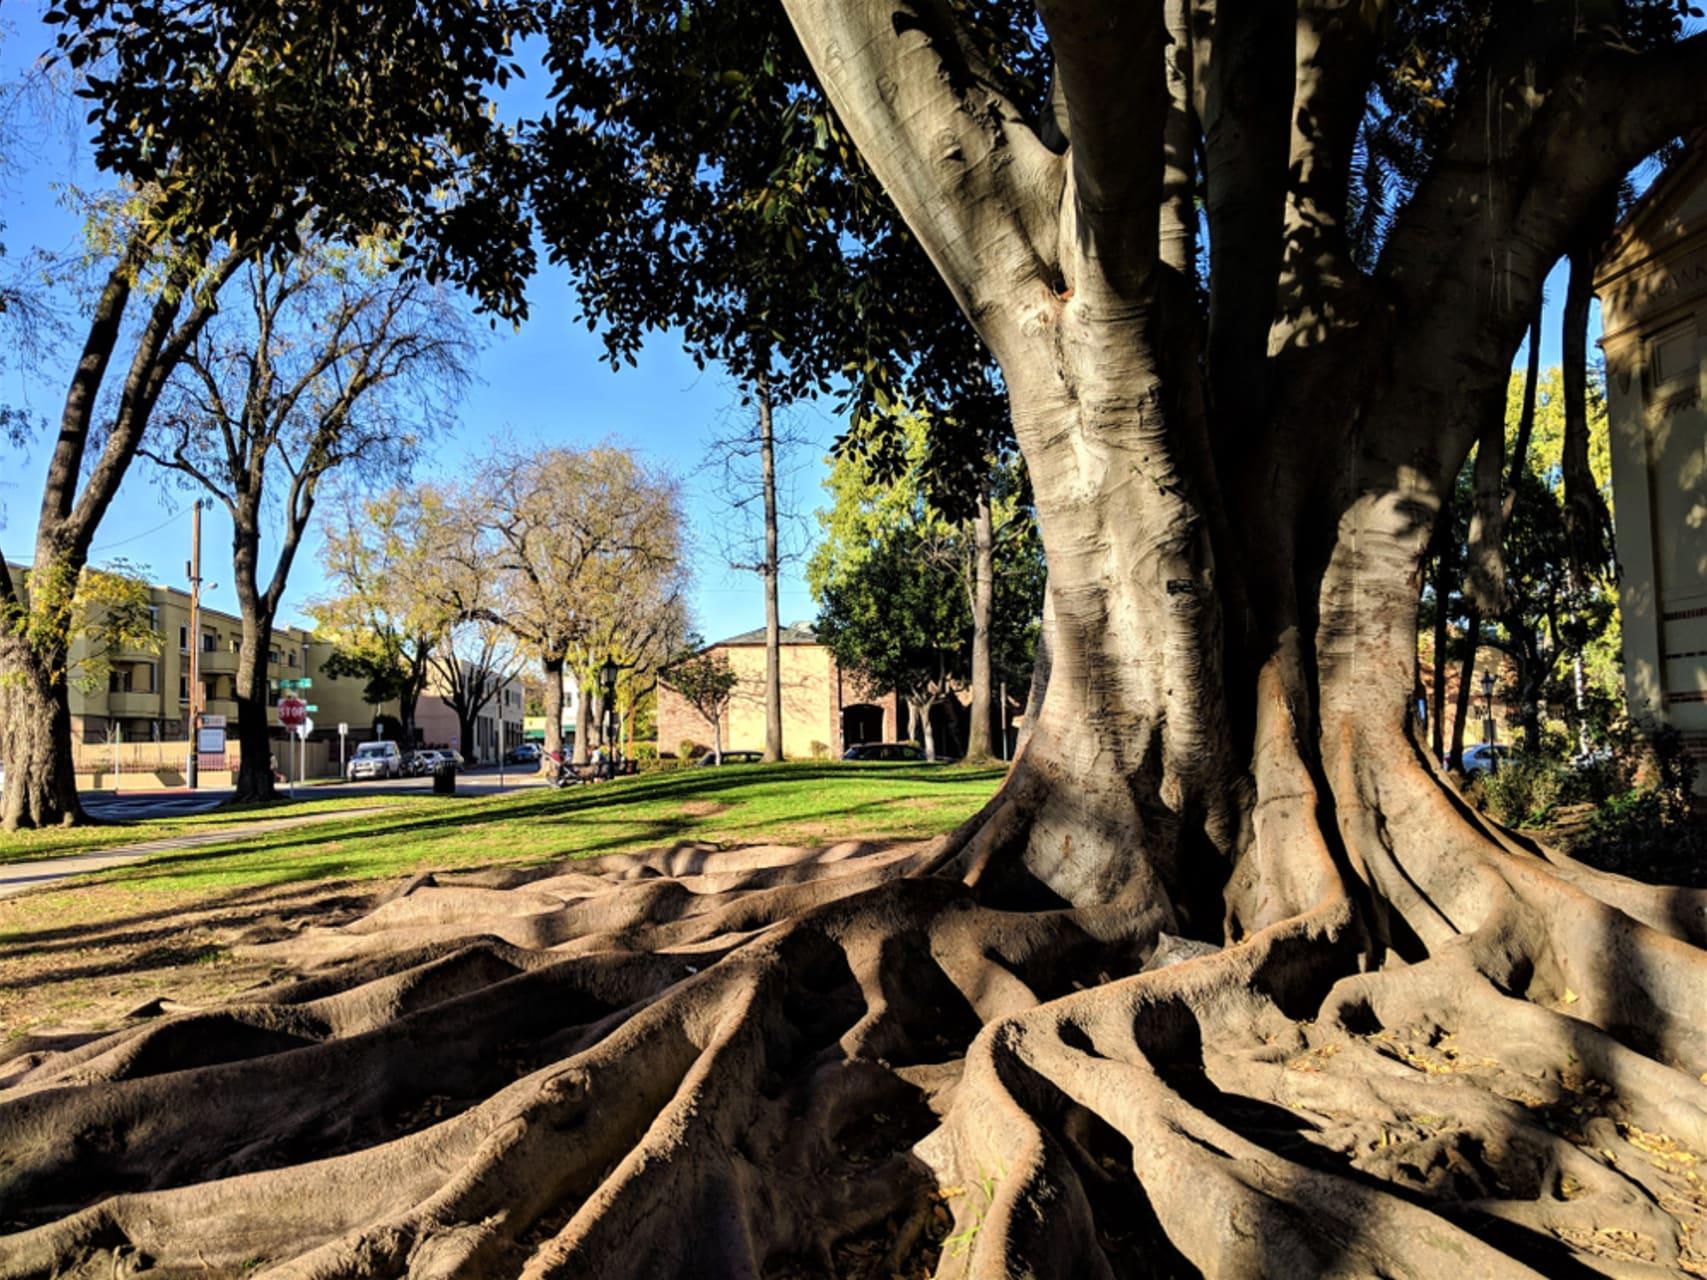 Los Angeles - The Neighborhoods of Los Angeles - Bungalow Heaven